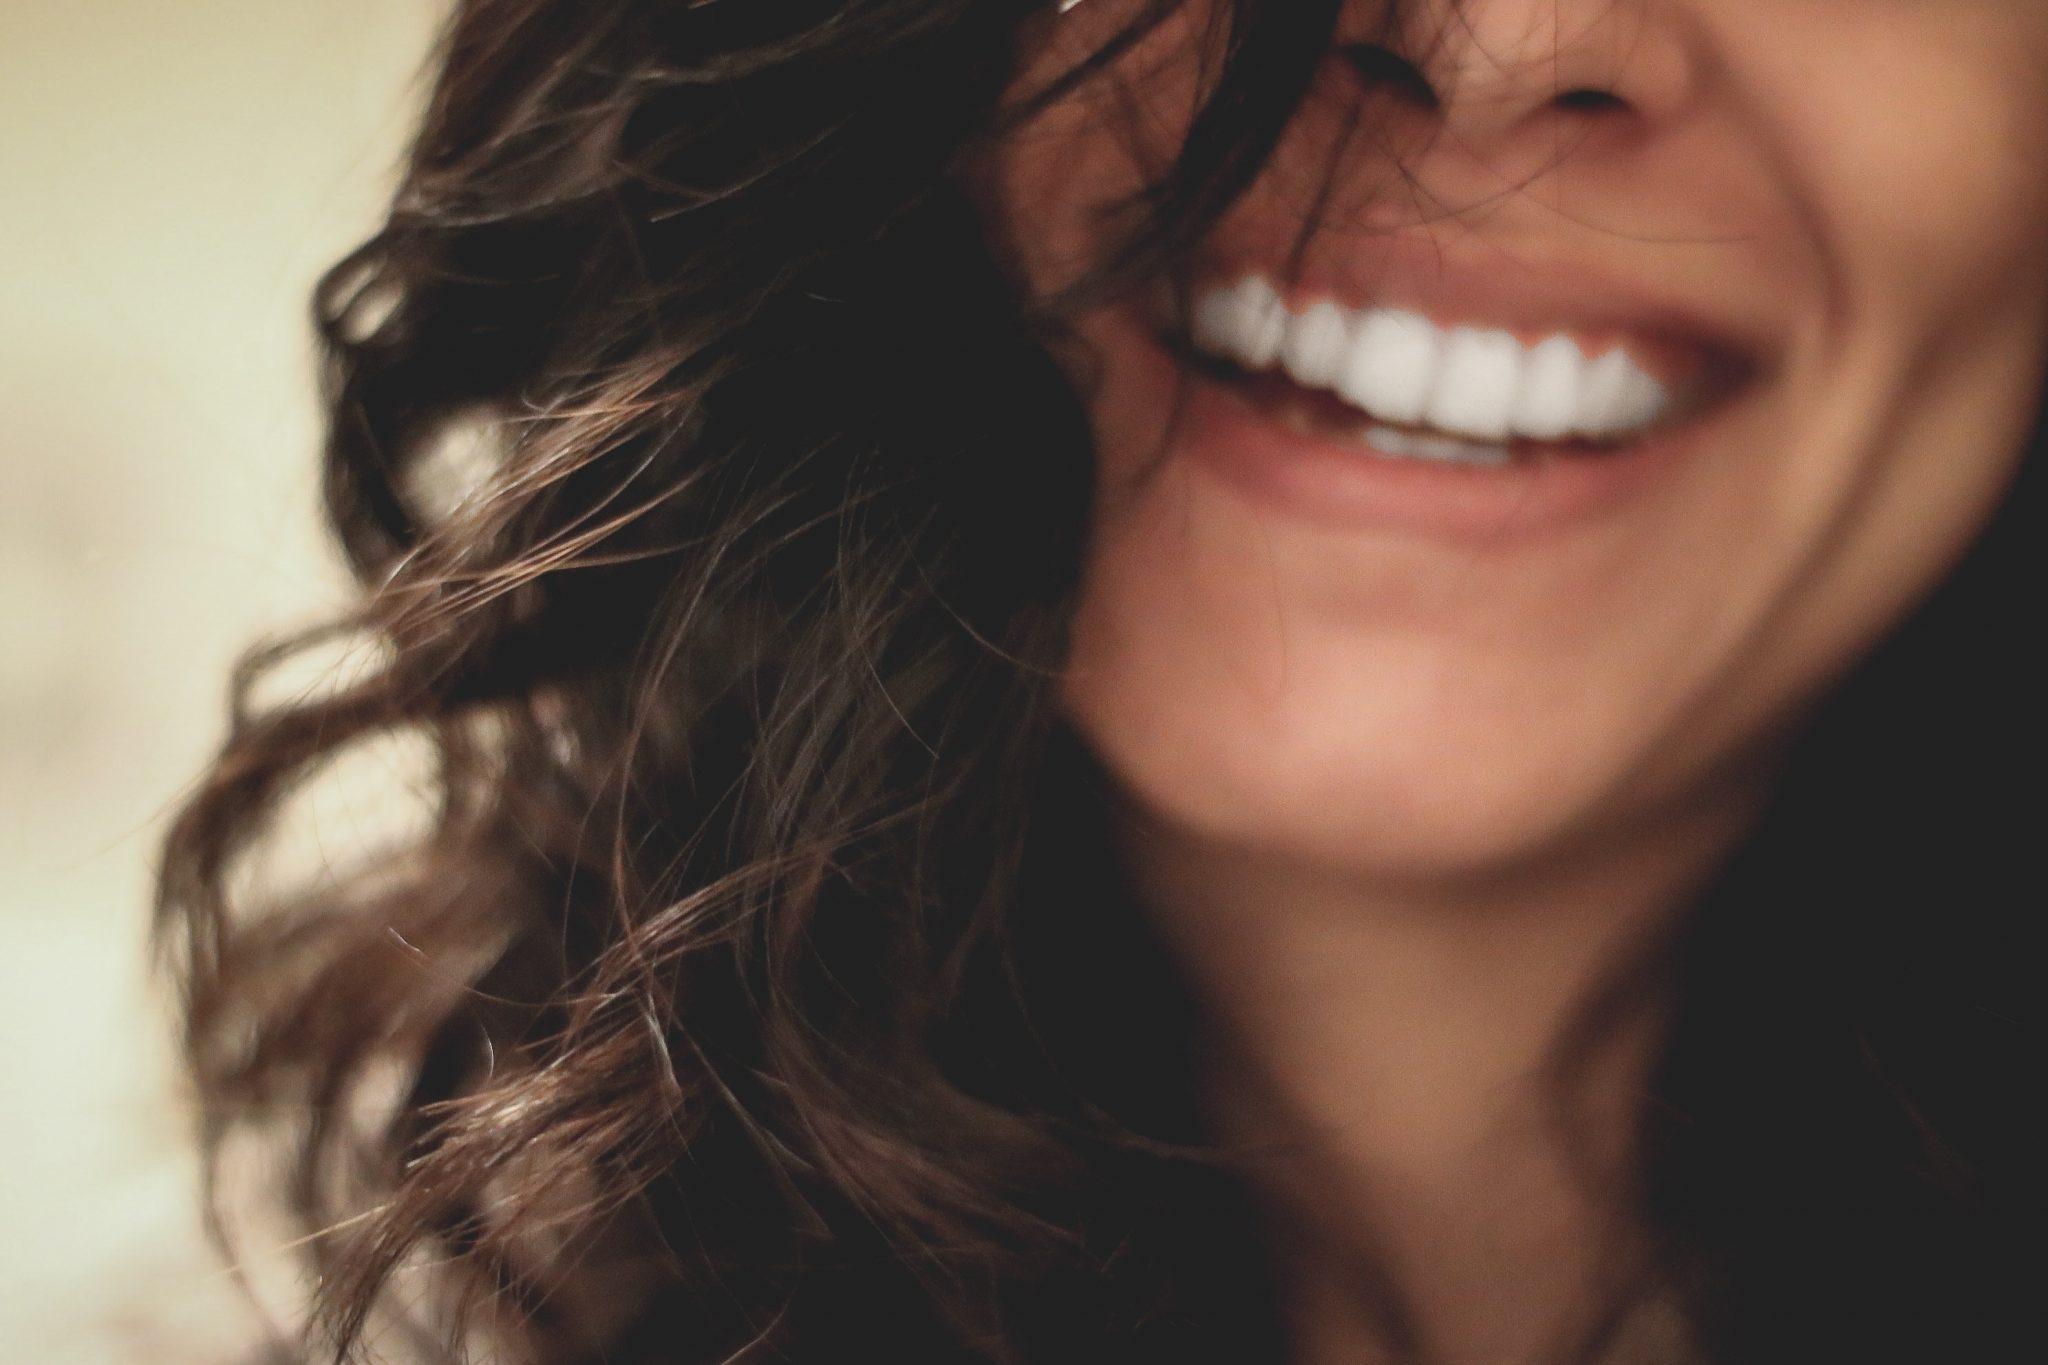 sonrisa-mujer-boca-salud